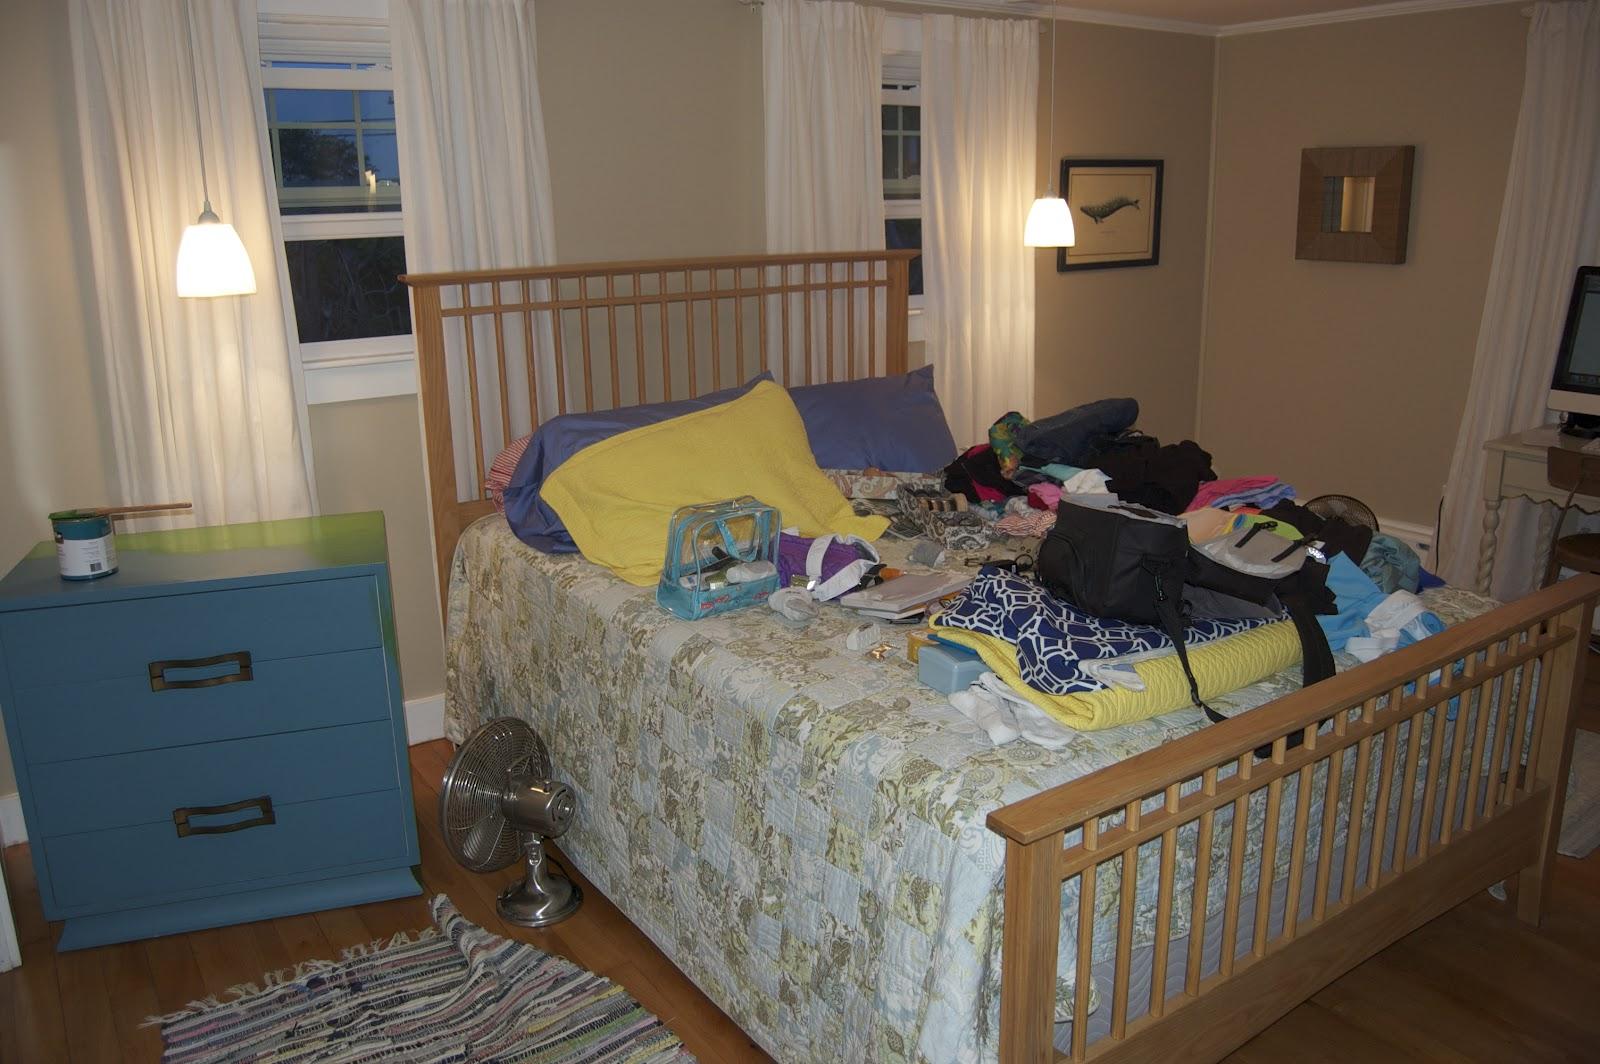 Preppy Bedroom: Seaside Shelter: Preppy Bedroom Update